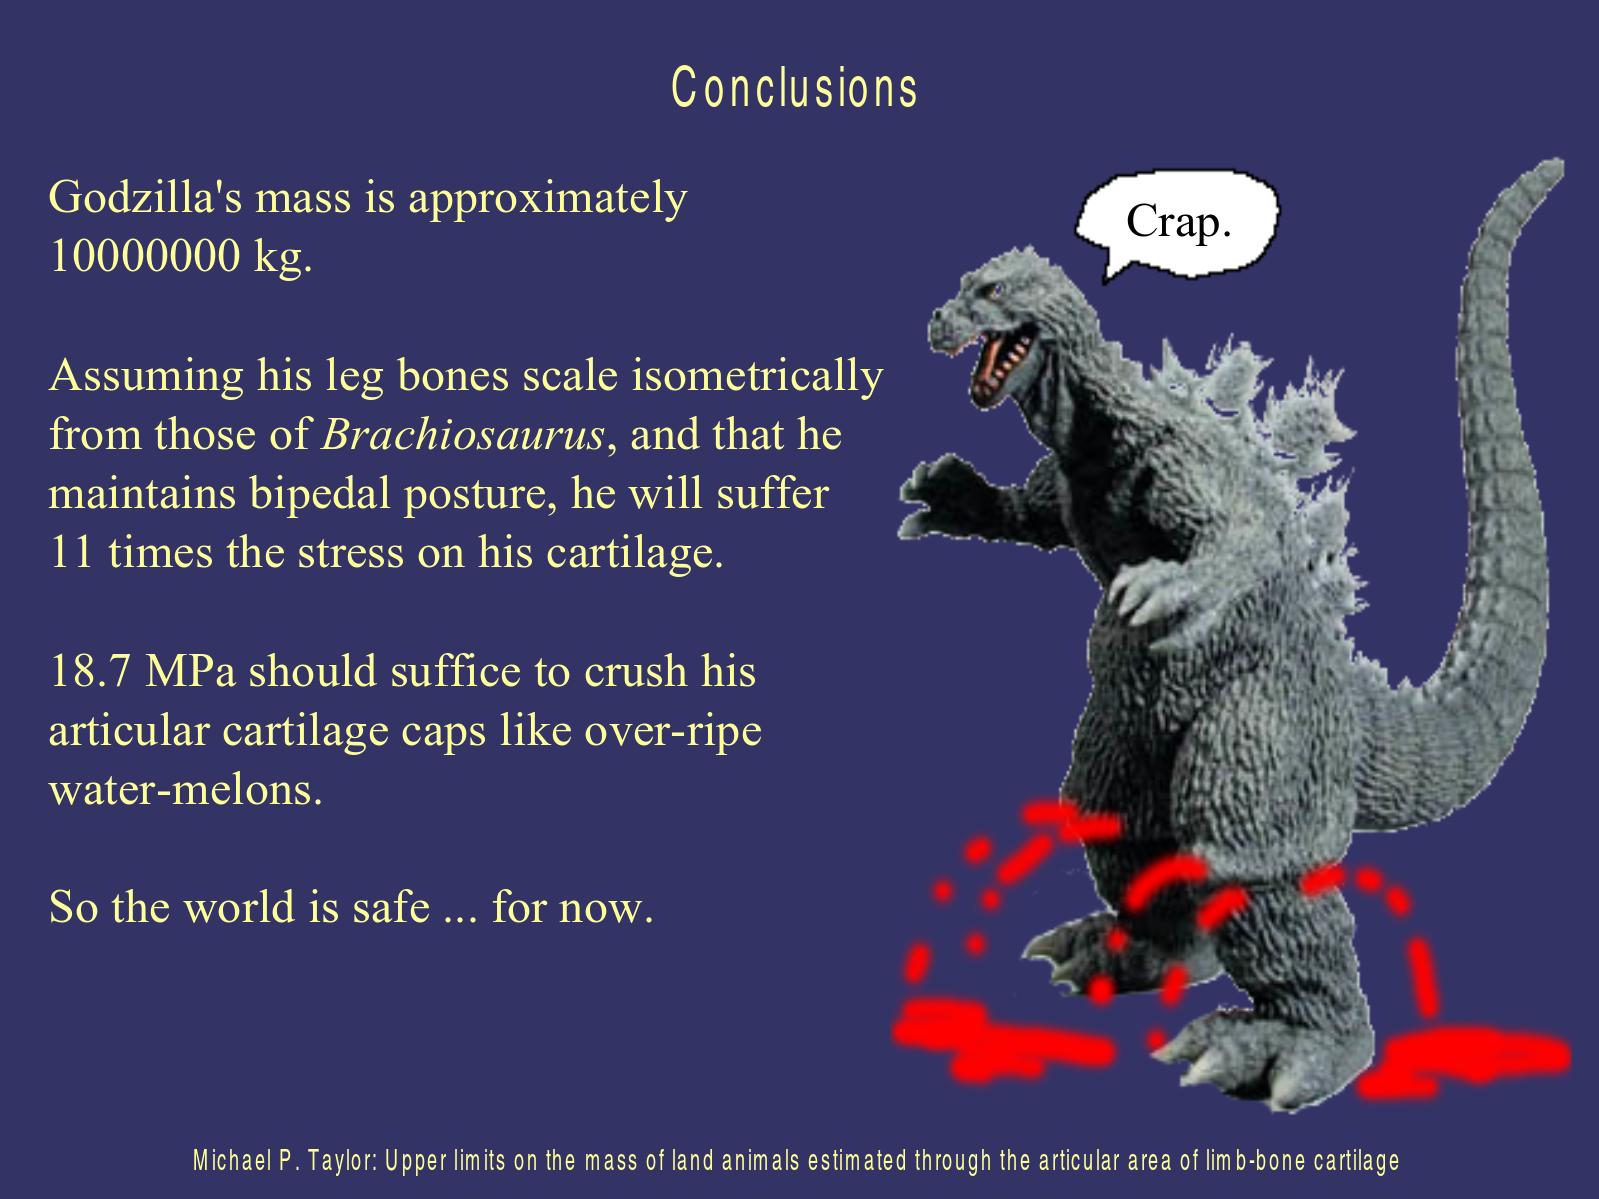 TRC #299: Godzilla + Book Reviews + Snuff Films | The Reality Check